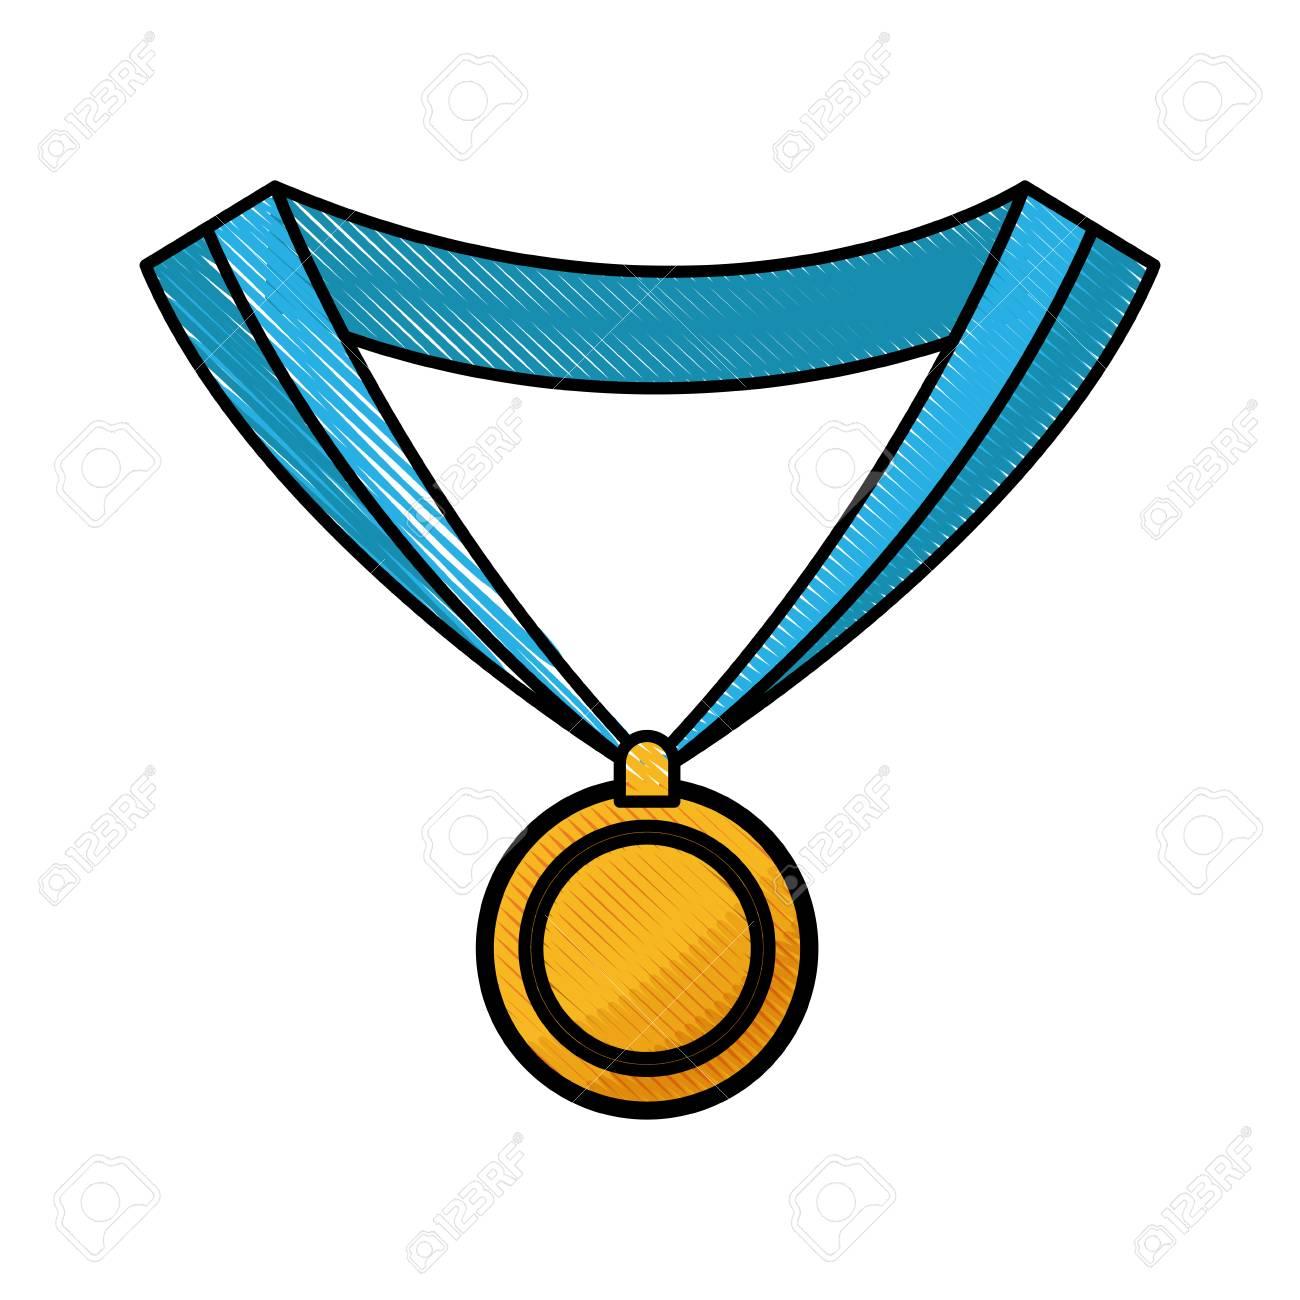 drawing medal award win sport image vector illustration royalty free